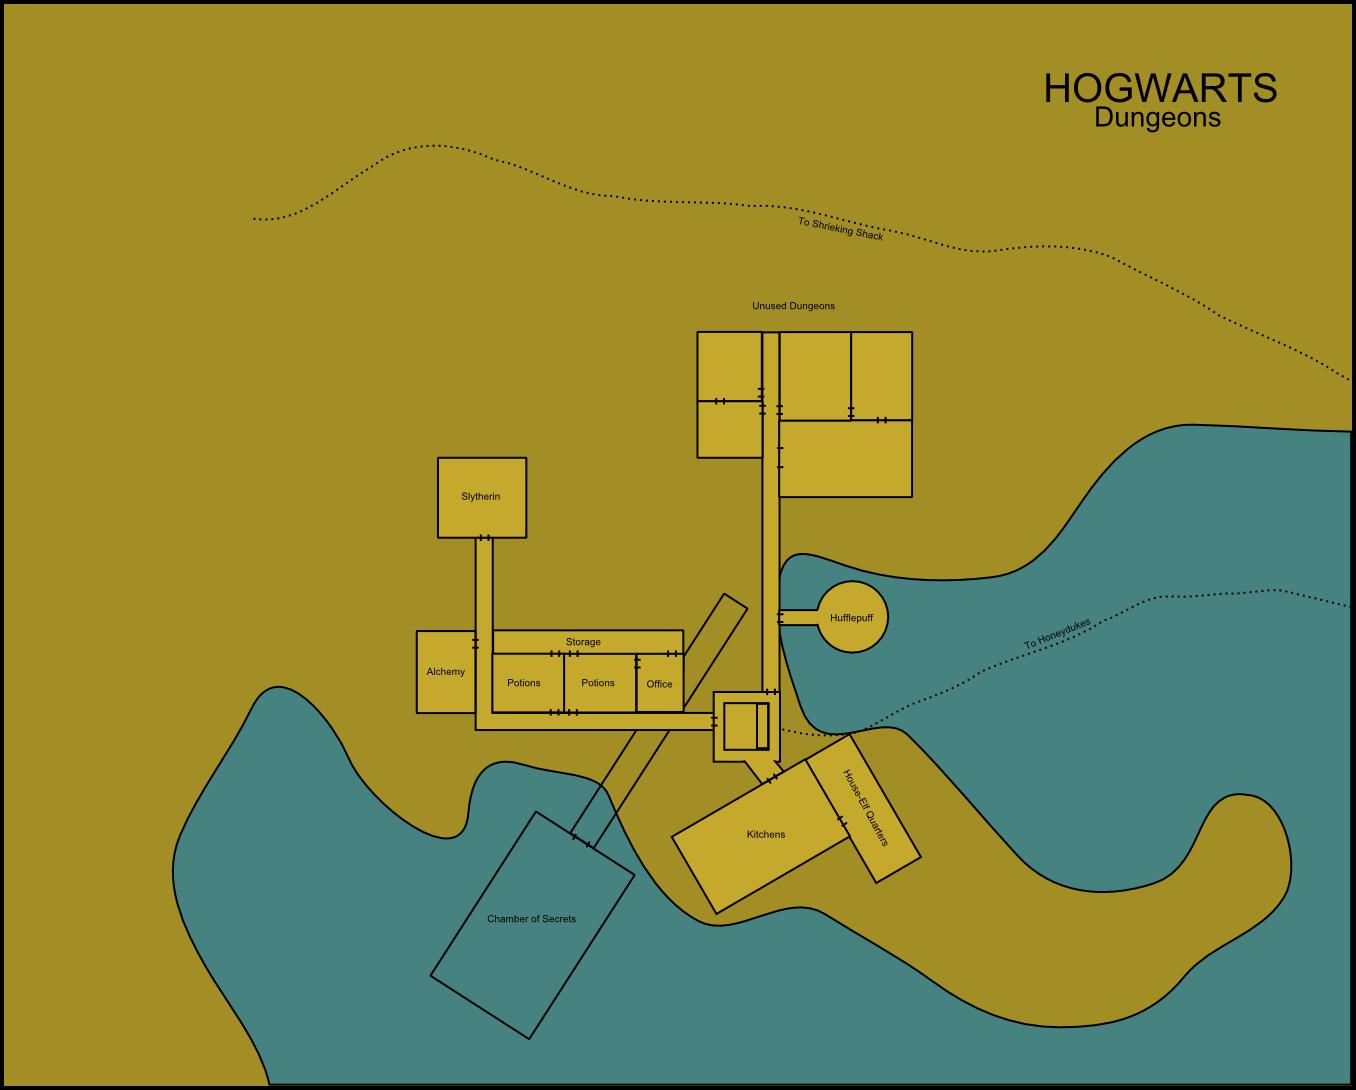 Hogwarts Dungeons